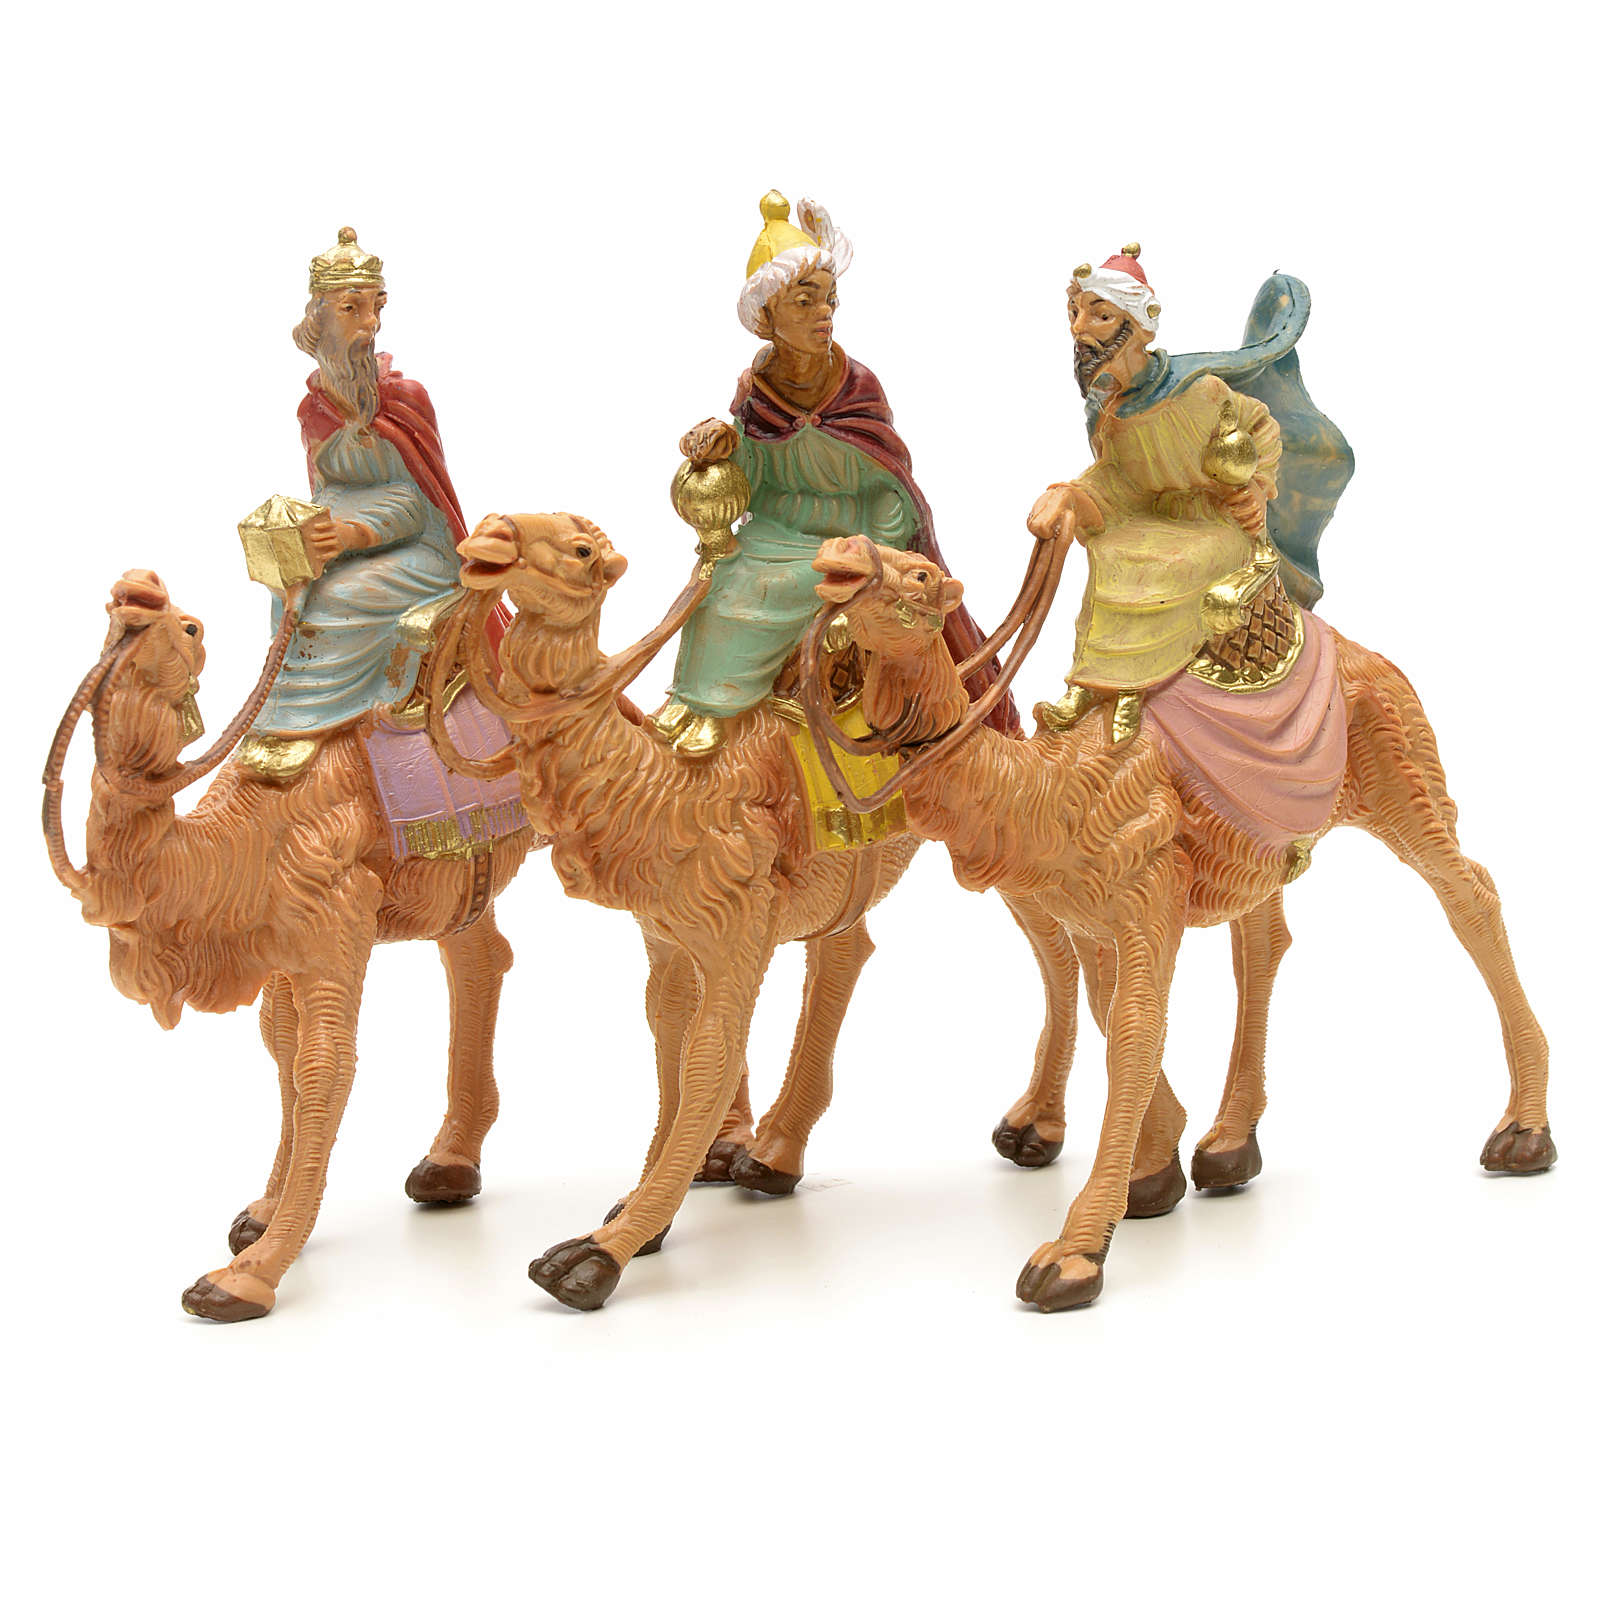 Krippenfigur drei heilige Könige mit Kamel 6.5 cm Fontanini 3